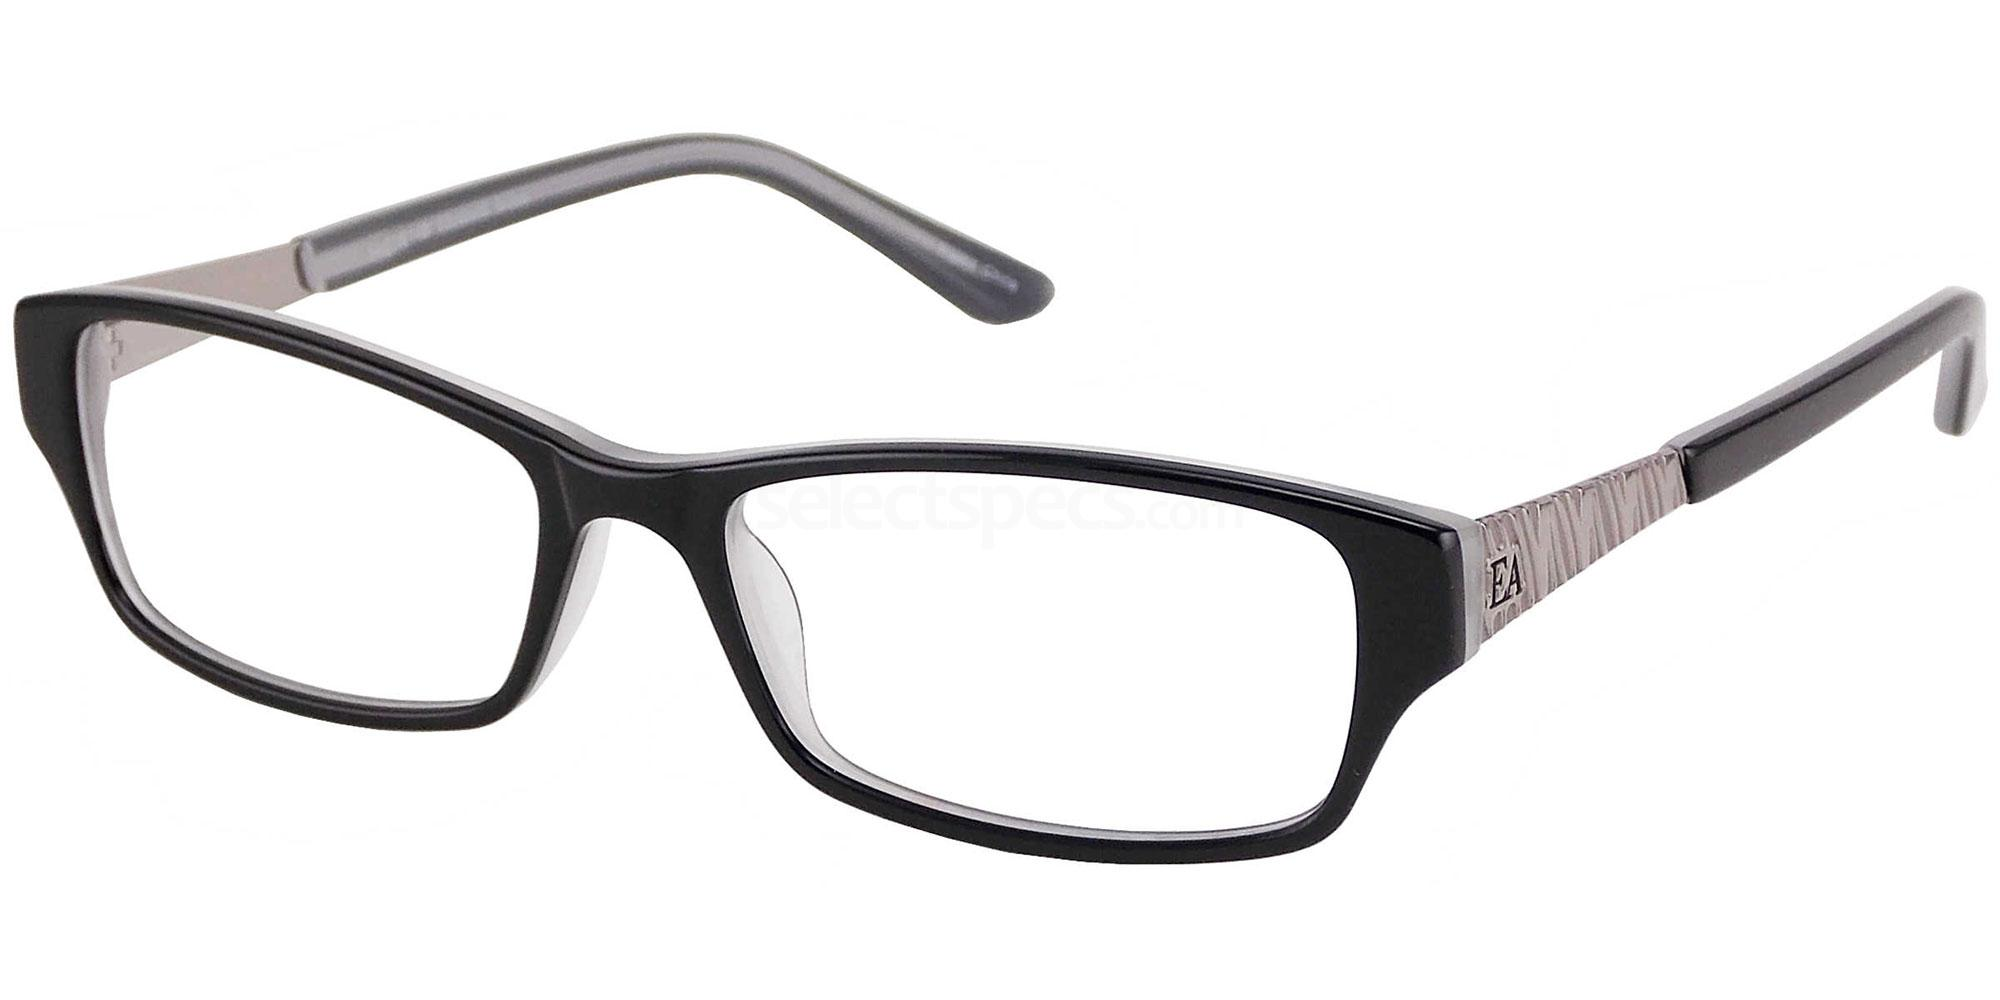 01 EA1115 Glasses, Elizabeth Arden